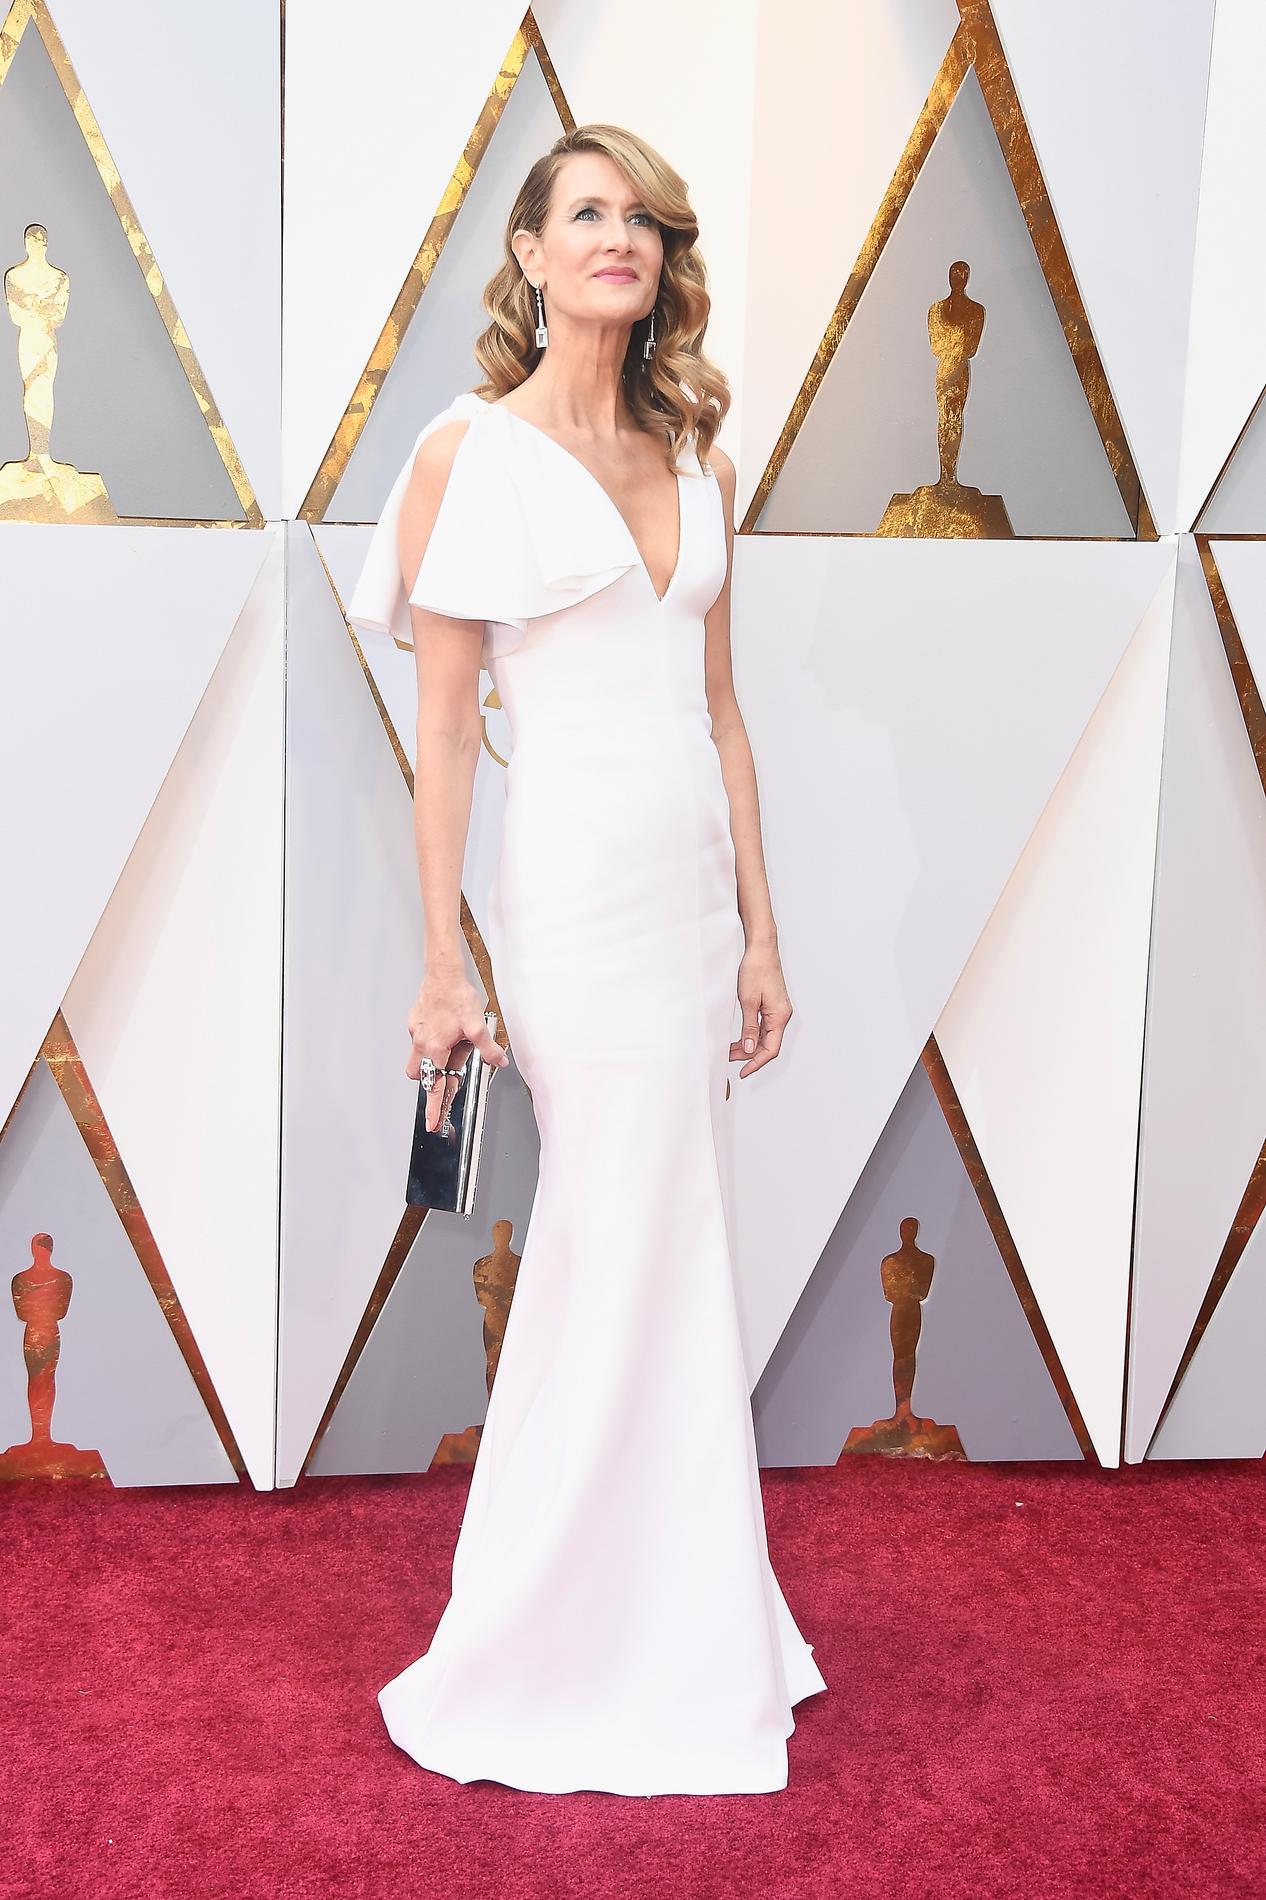 Margot Robbie, Nicole Kidman, Jennifer Lawrence    Les plus